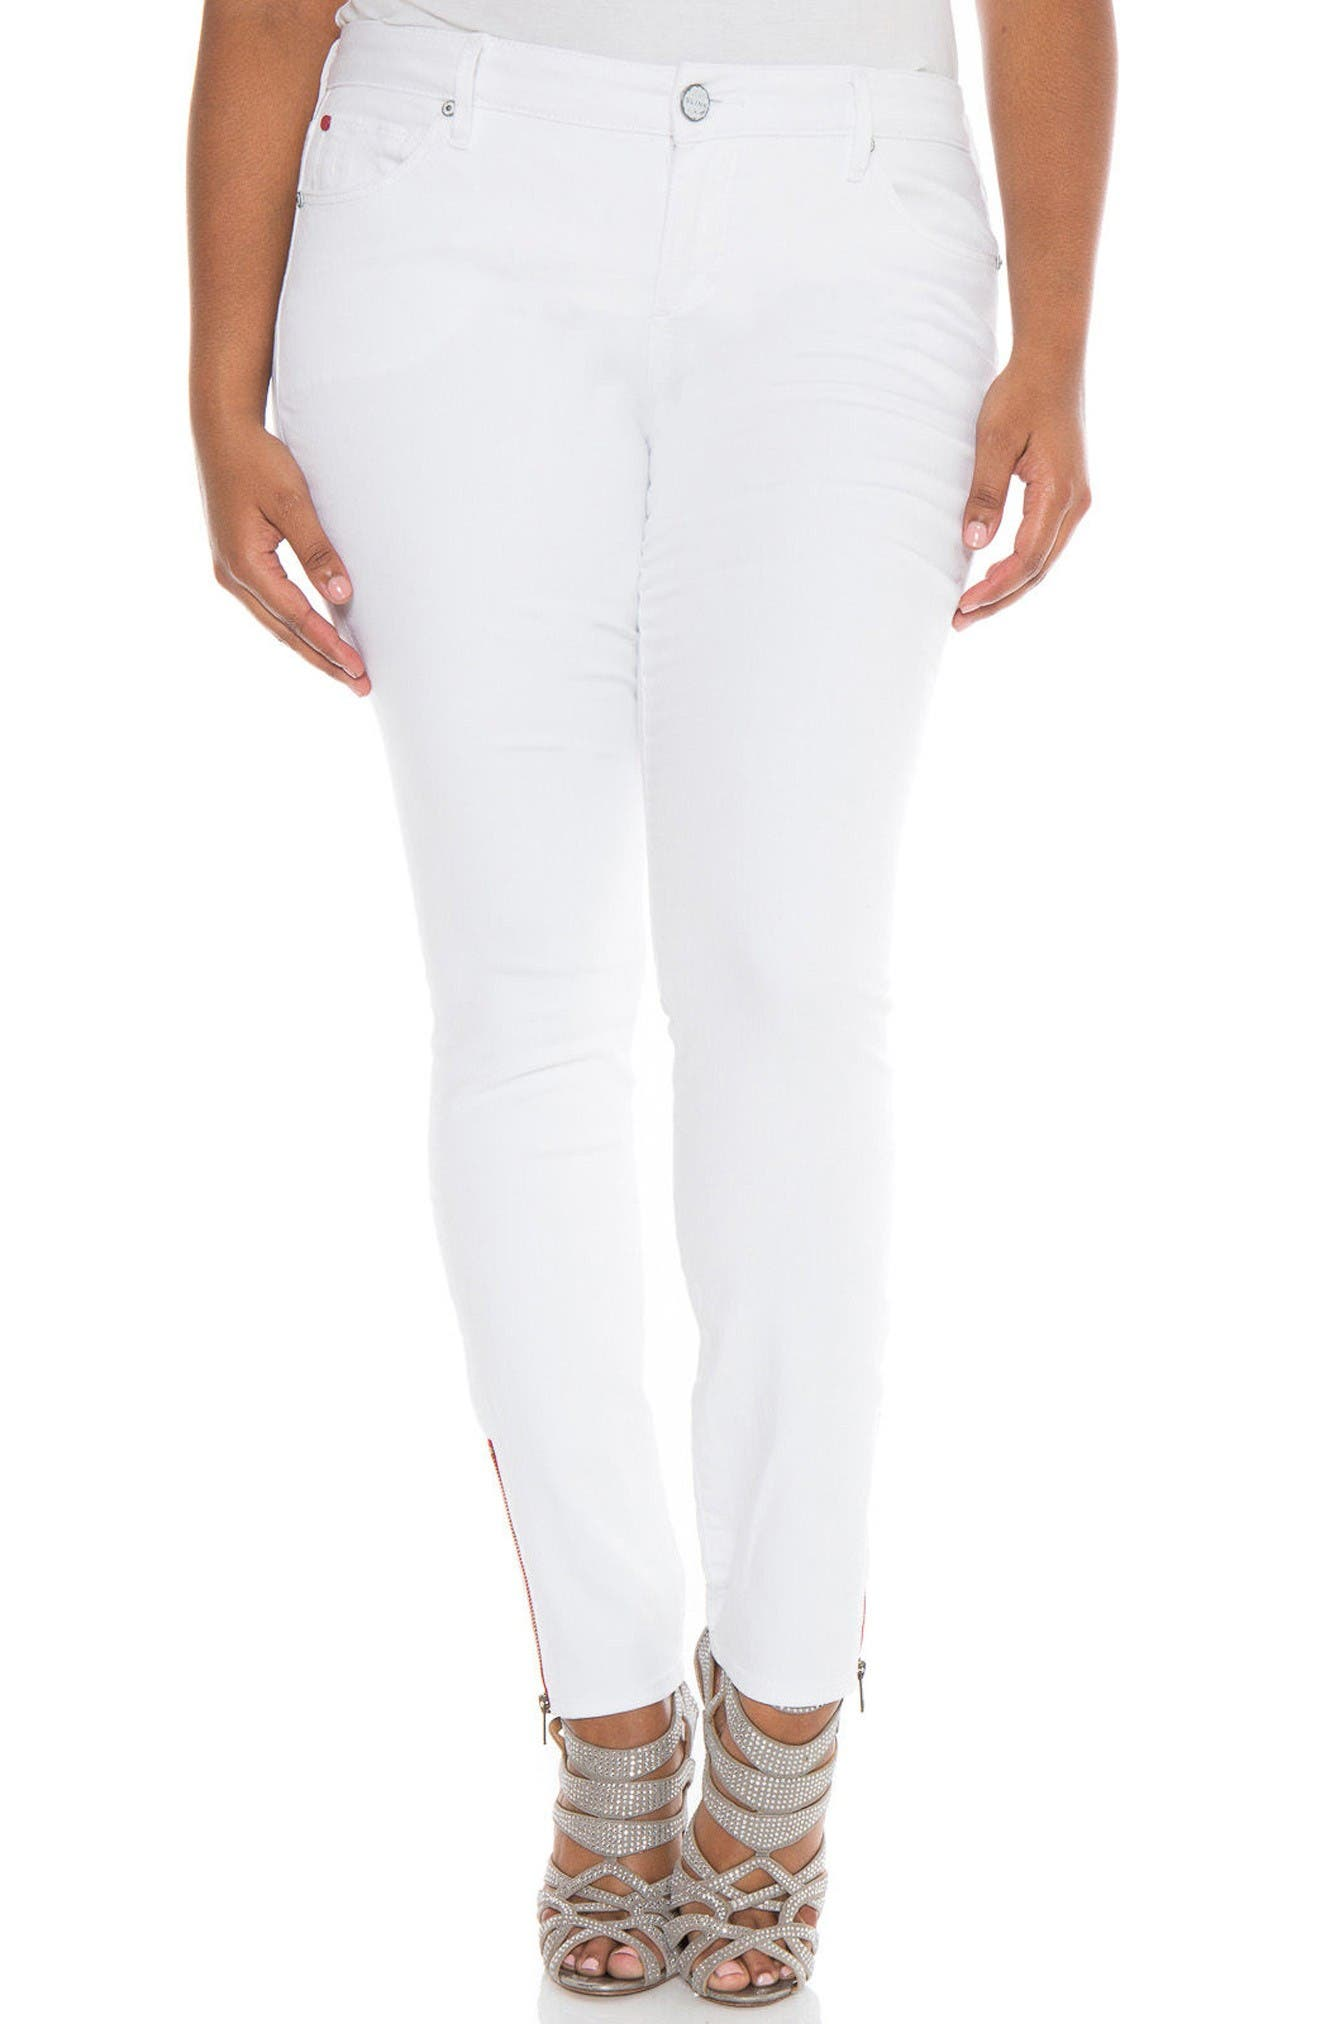 SLINK Jeans Ankle Zip Skinny Jeans (Josie) (Plus Size)